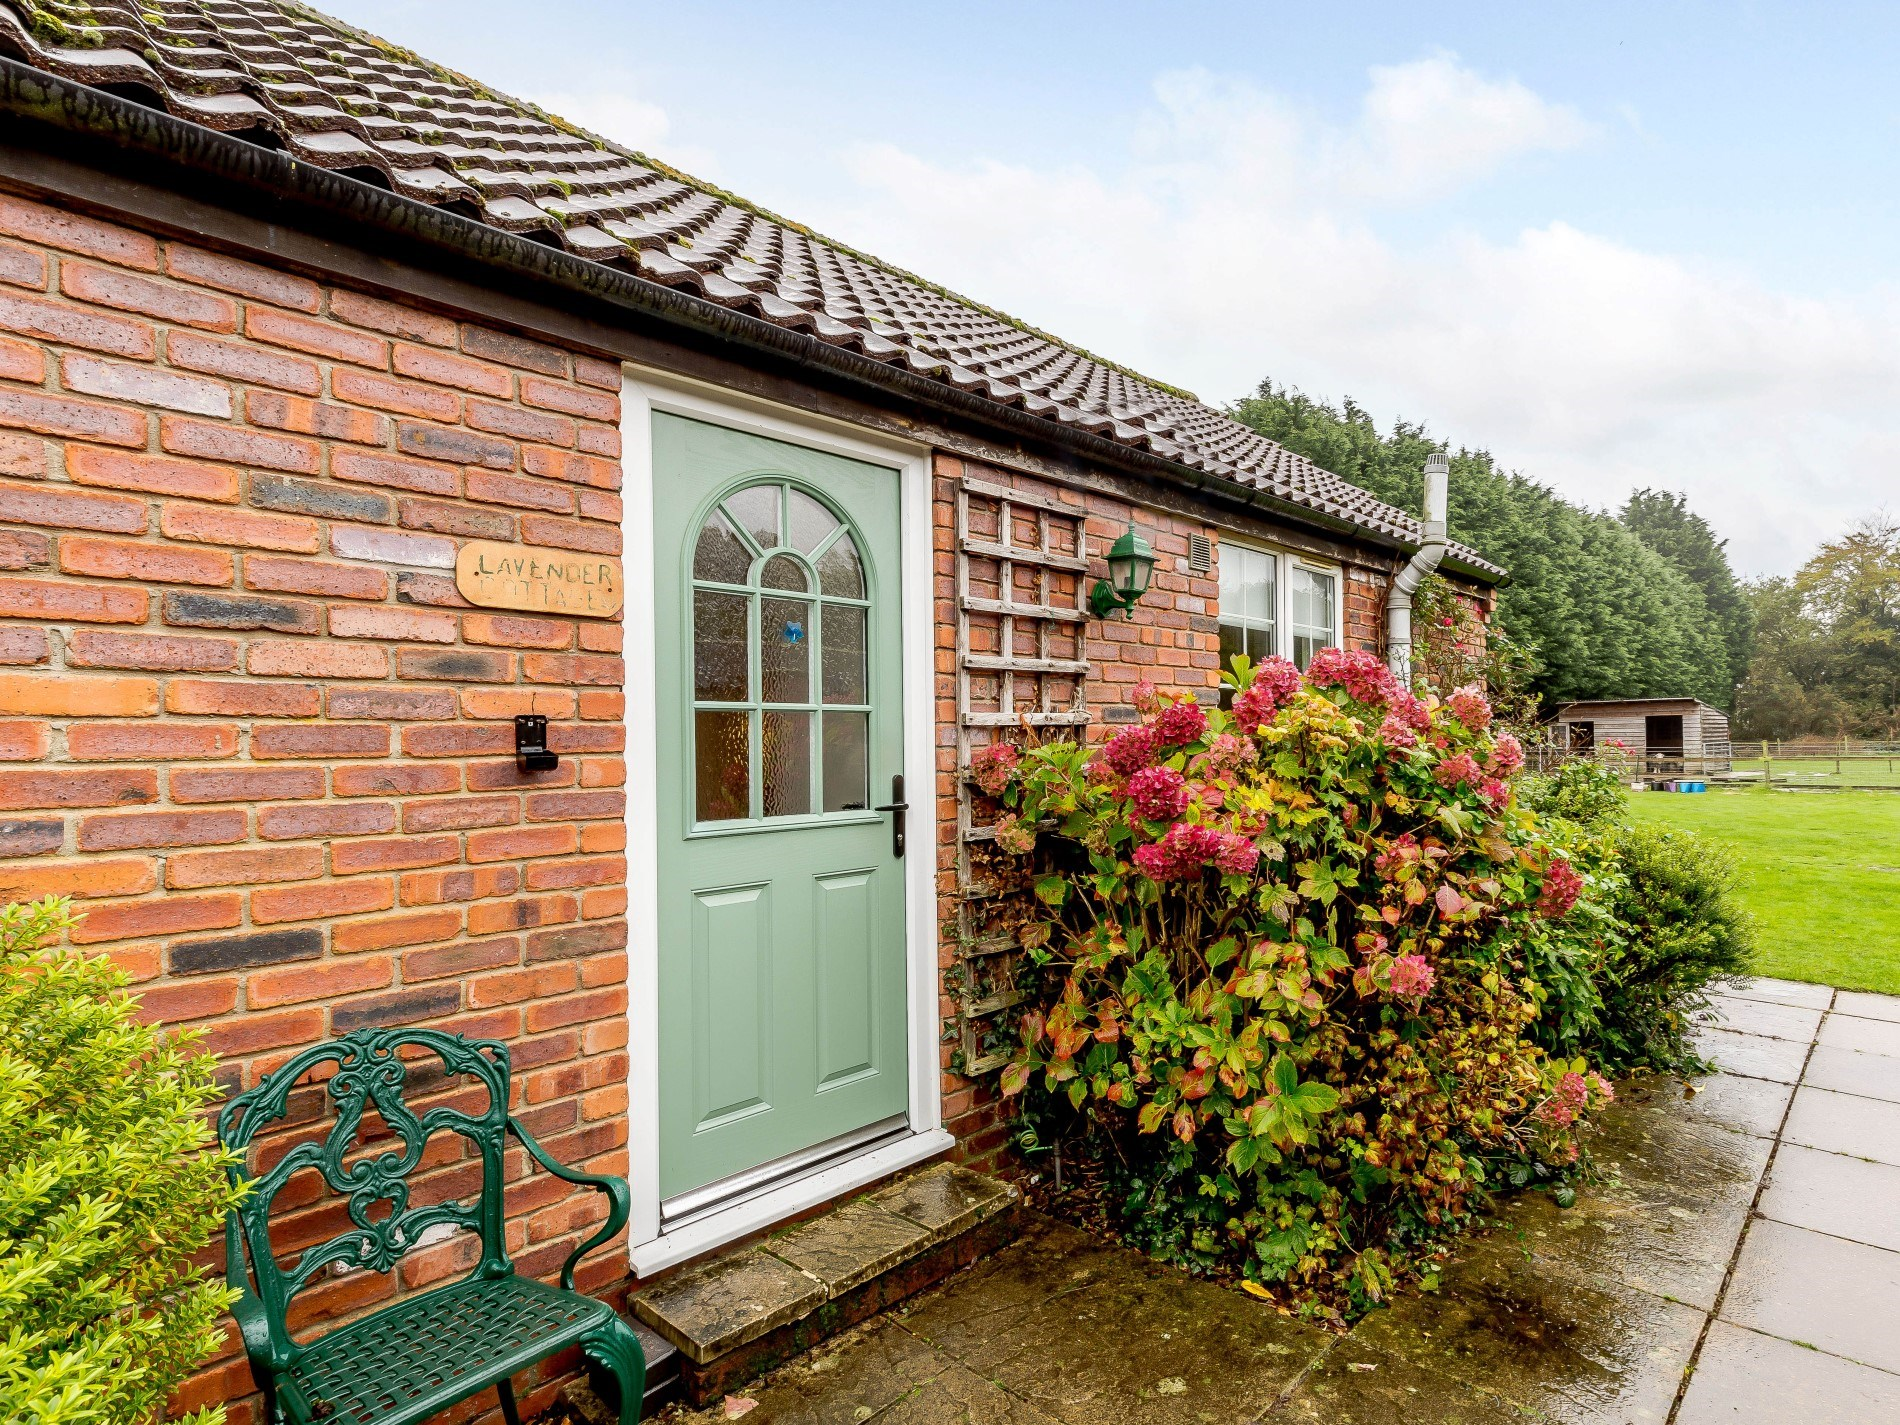 1 Bedroom Bungalow in Norfolk, East Anglia